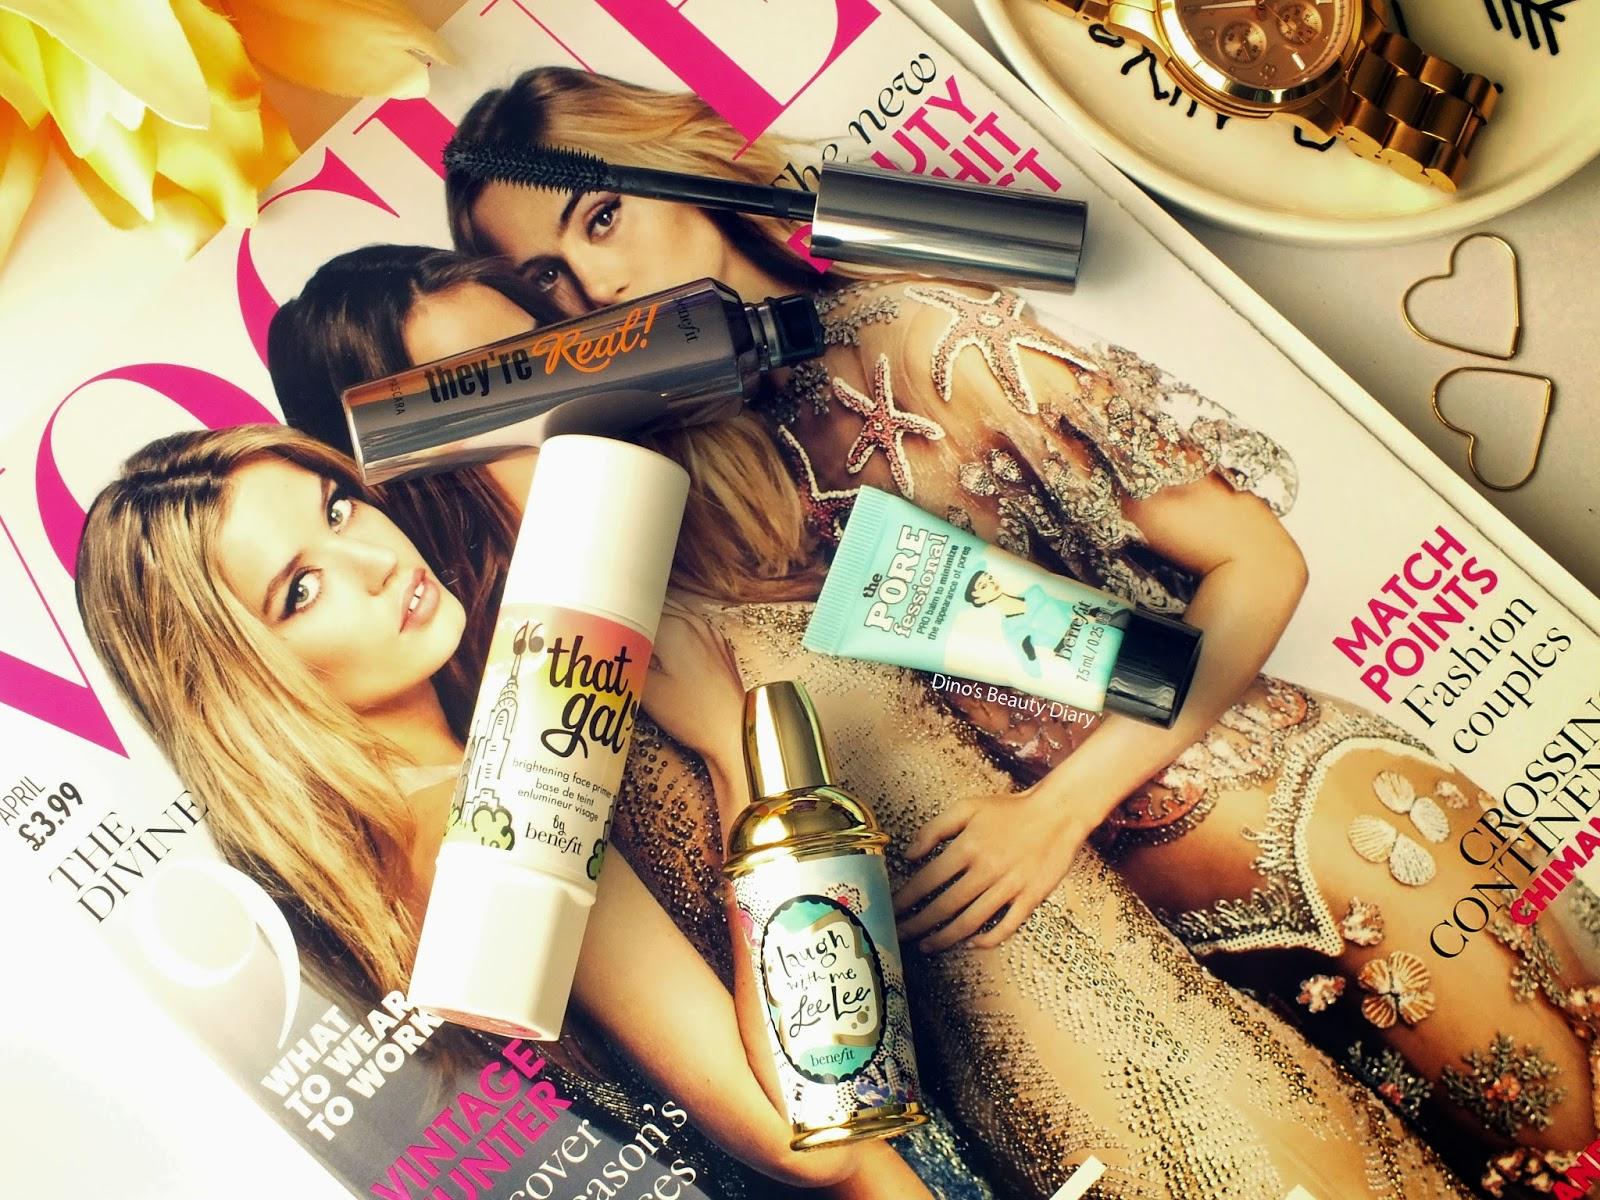 Dino's Beauty Diary - Benefit 'Lee Lee's Beauty Secrets'